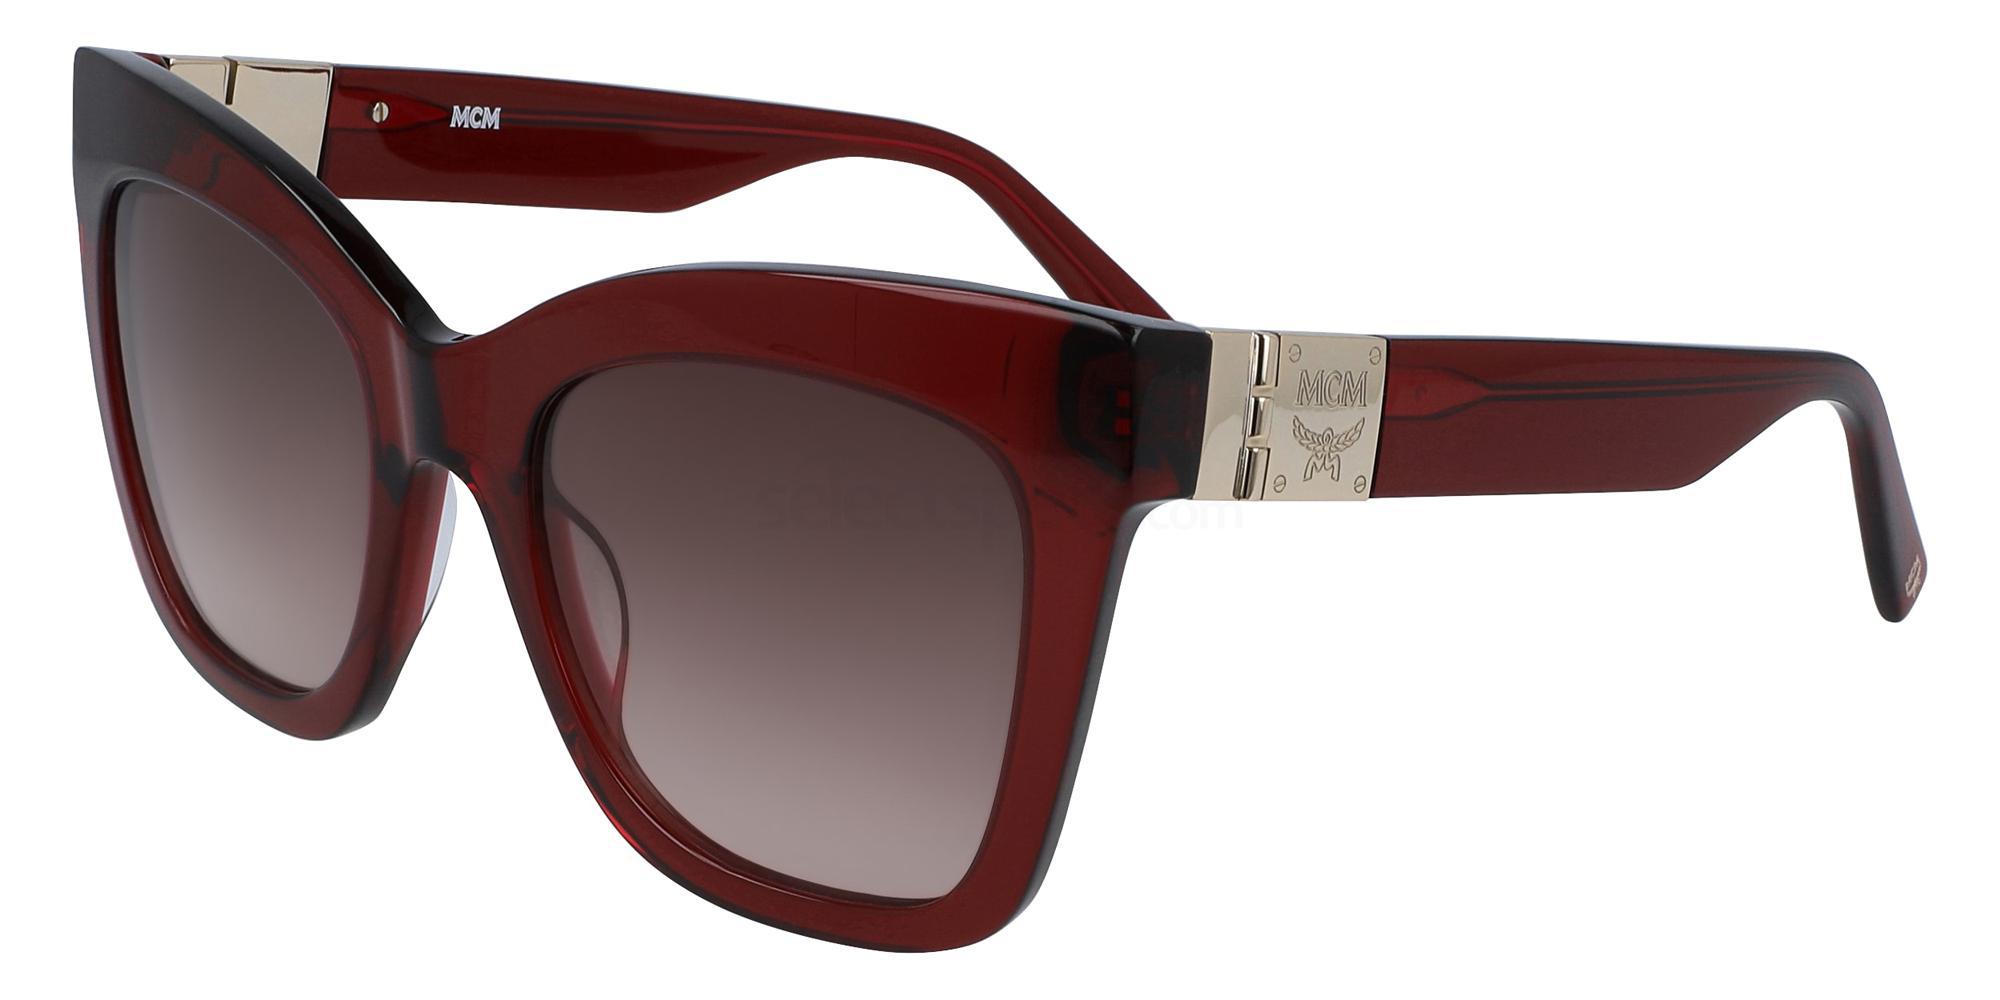 615 MCM686S Sunglasses, MCM